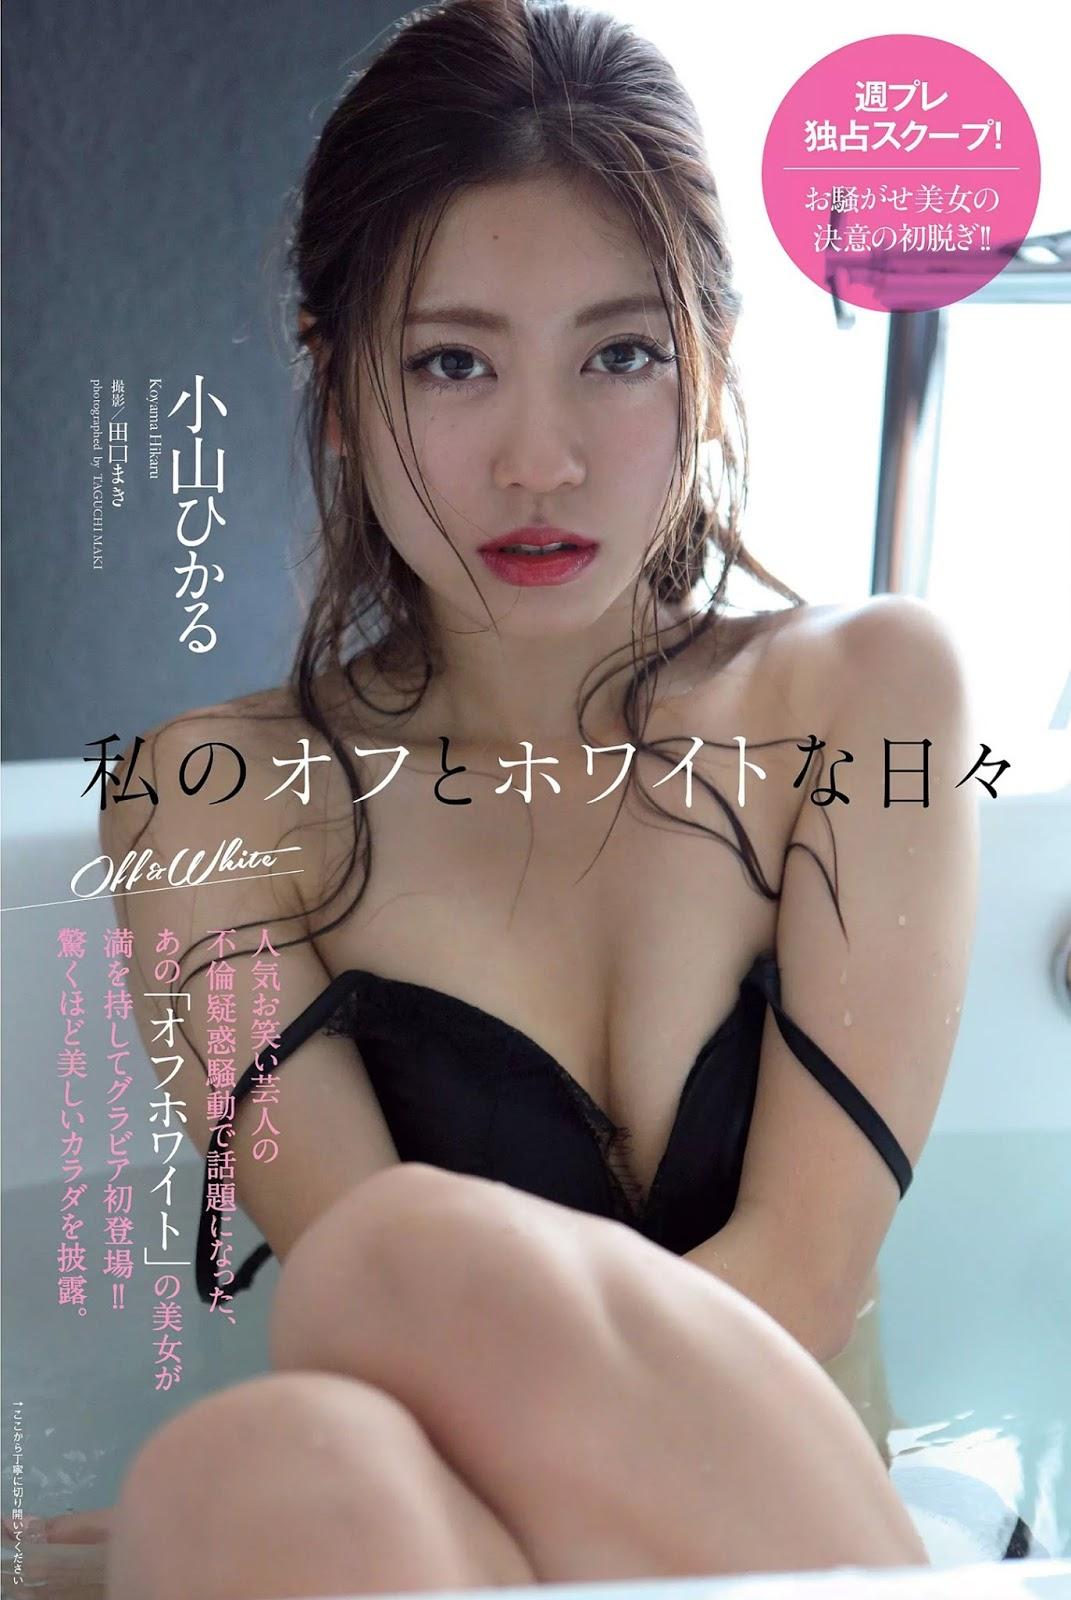 Hikaru Koyama 小山ひかる, Weekly Playboy 2017 No.43 (週刊プレイボーイ 2017年43号)